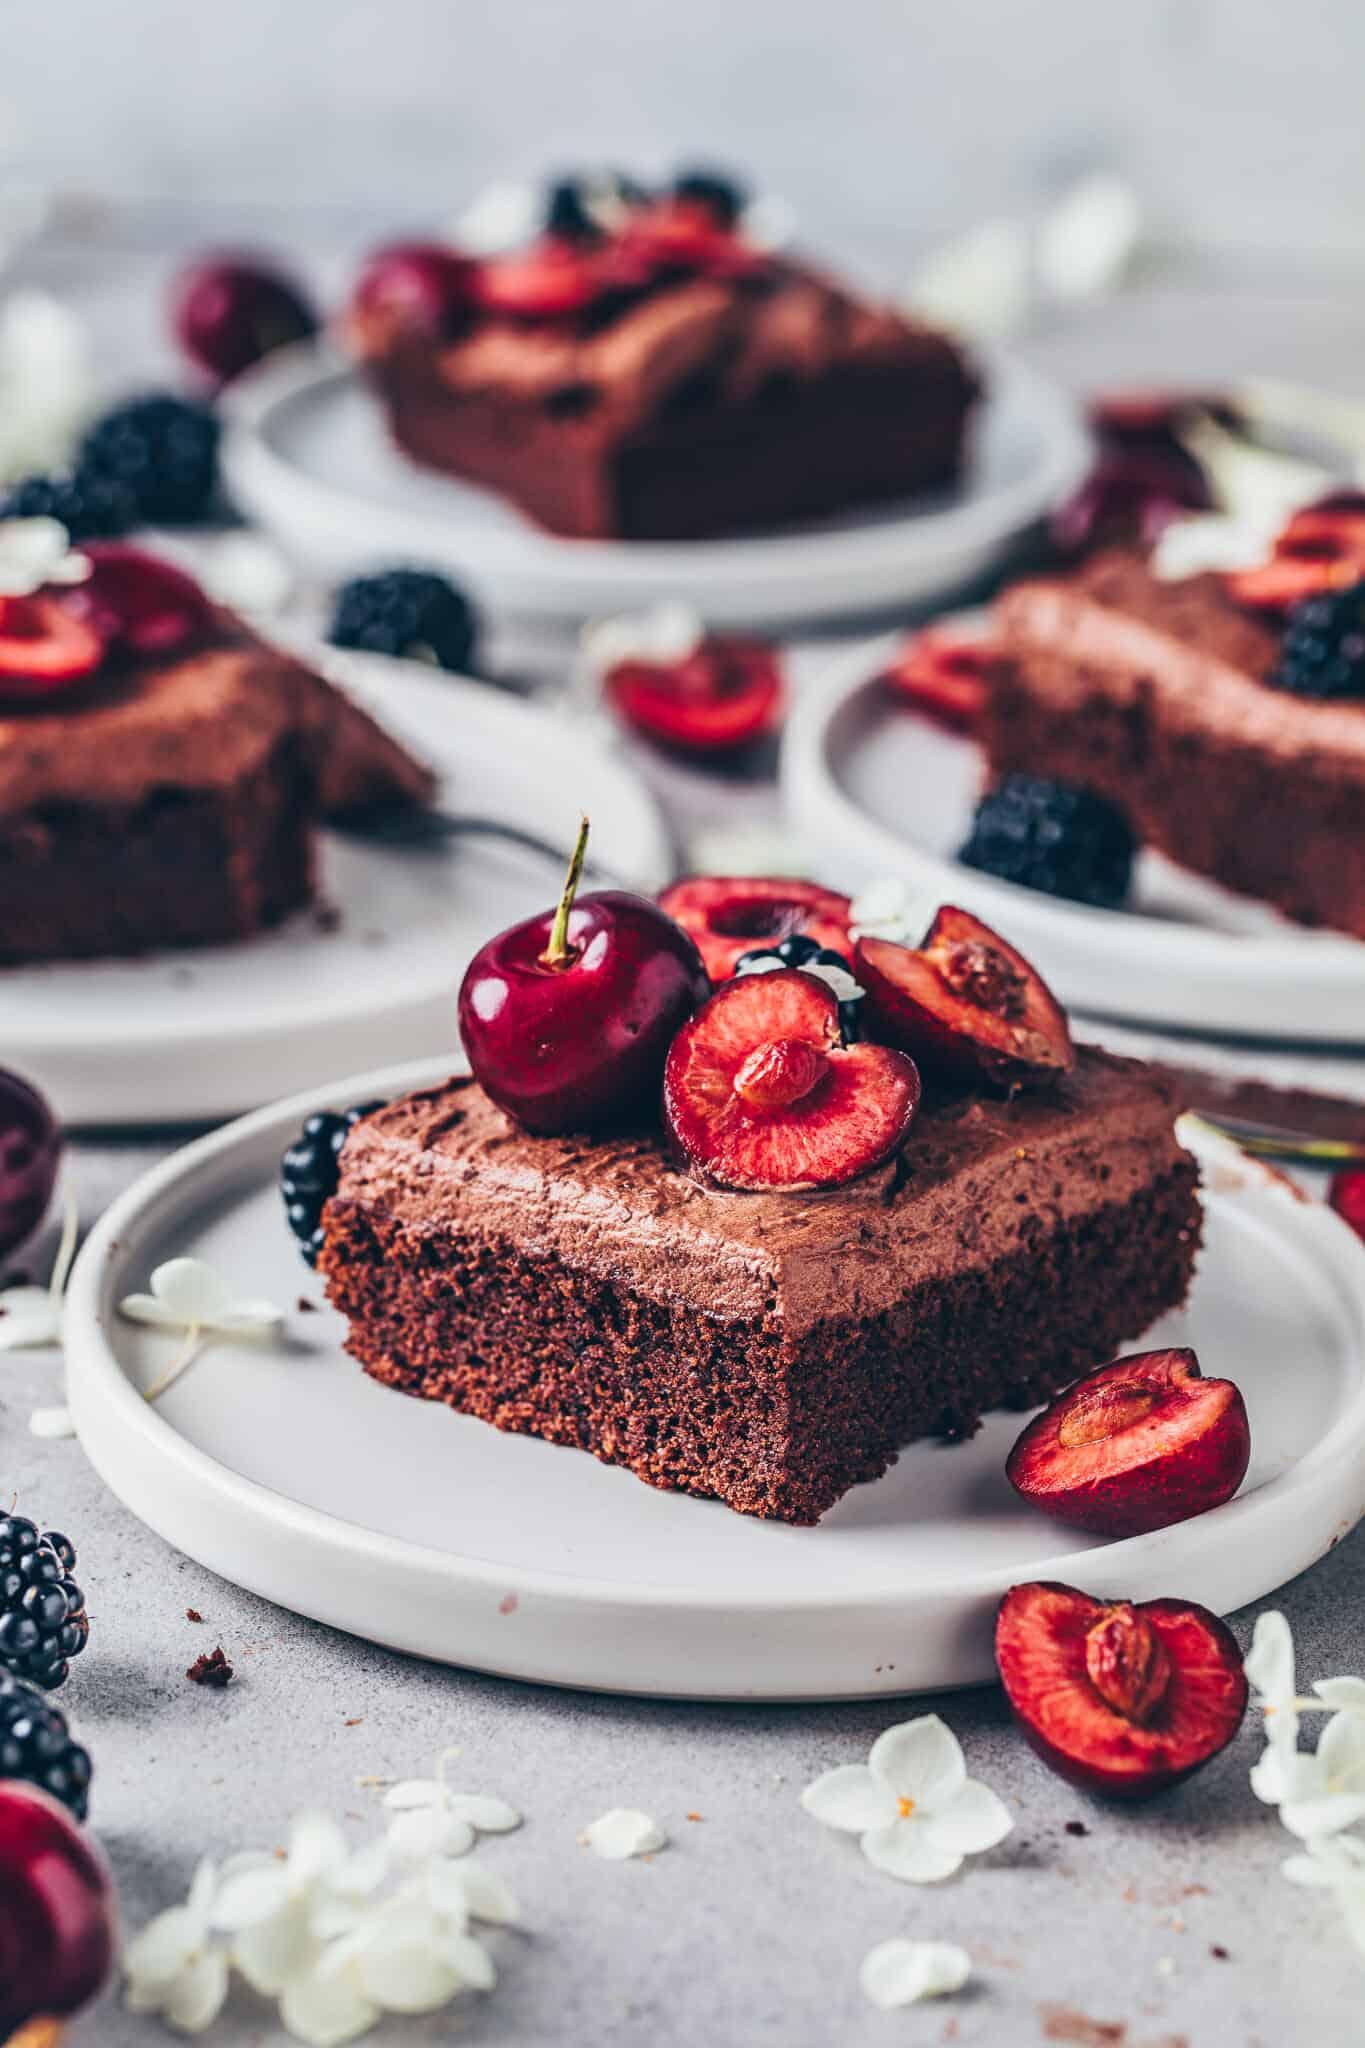 Chocolate cake with chocolate frosting, cherries and blackberries. Vegan brownie sheet cake.